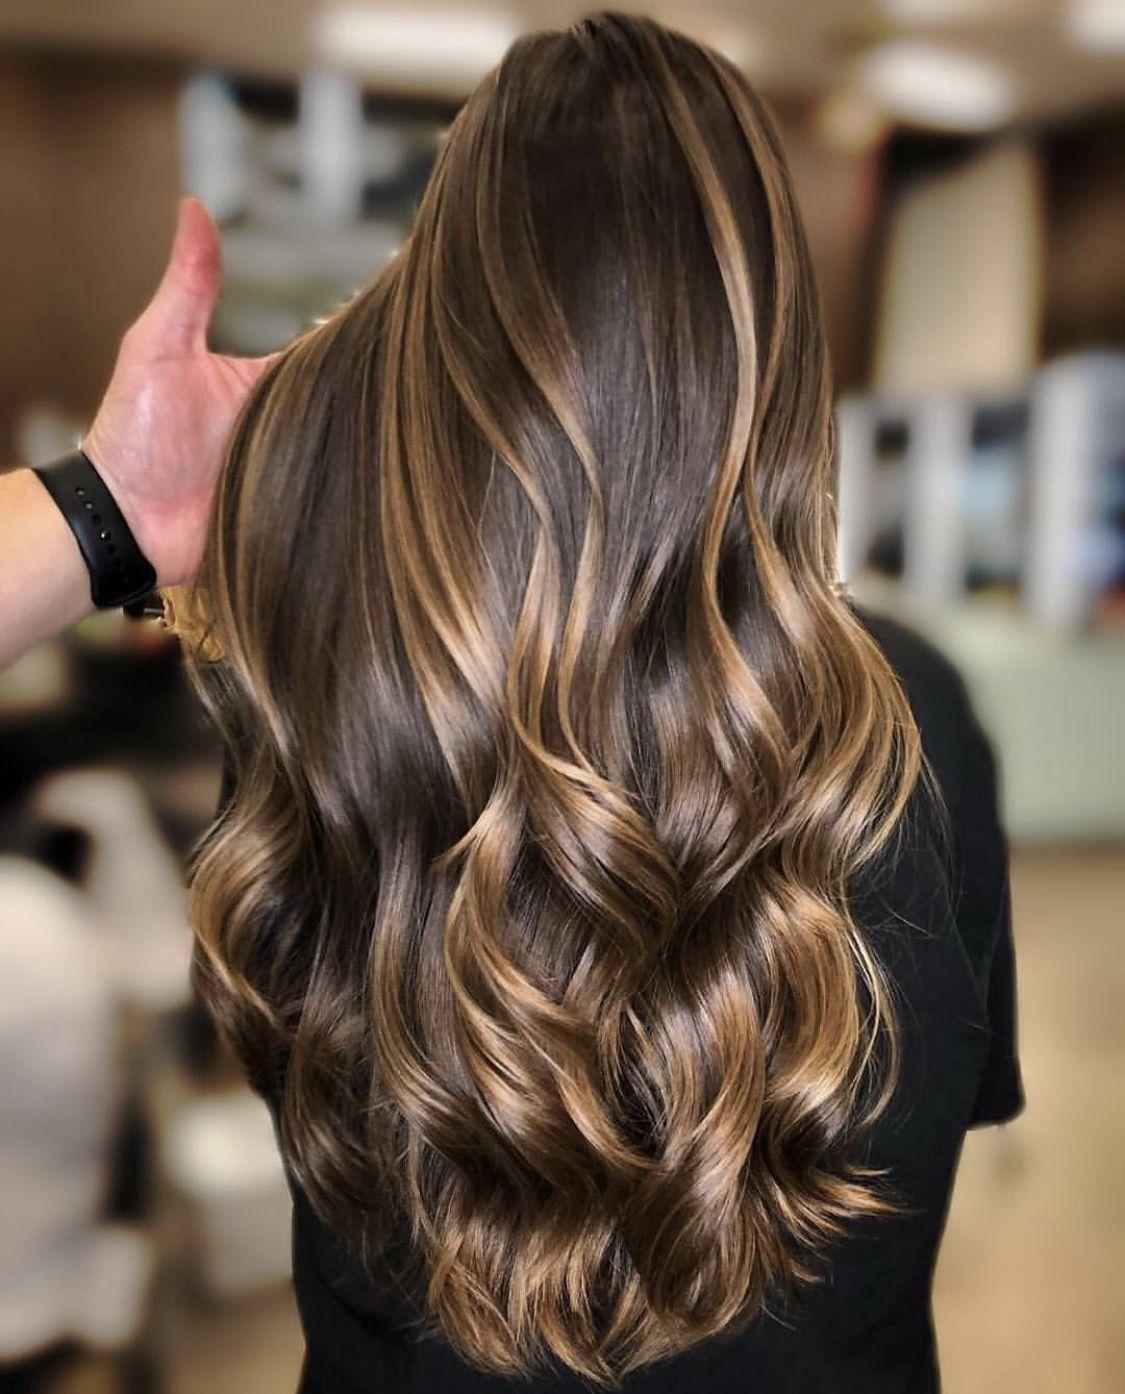 Hair Inspiration 2019-04-23 23:32:55